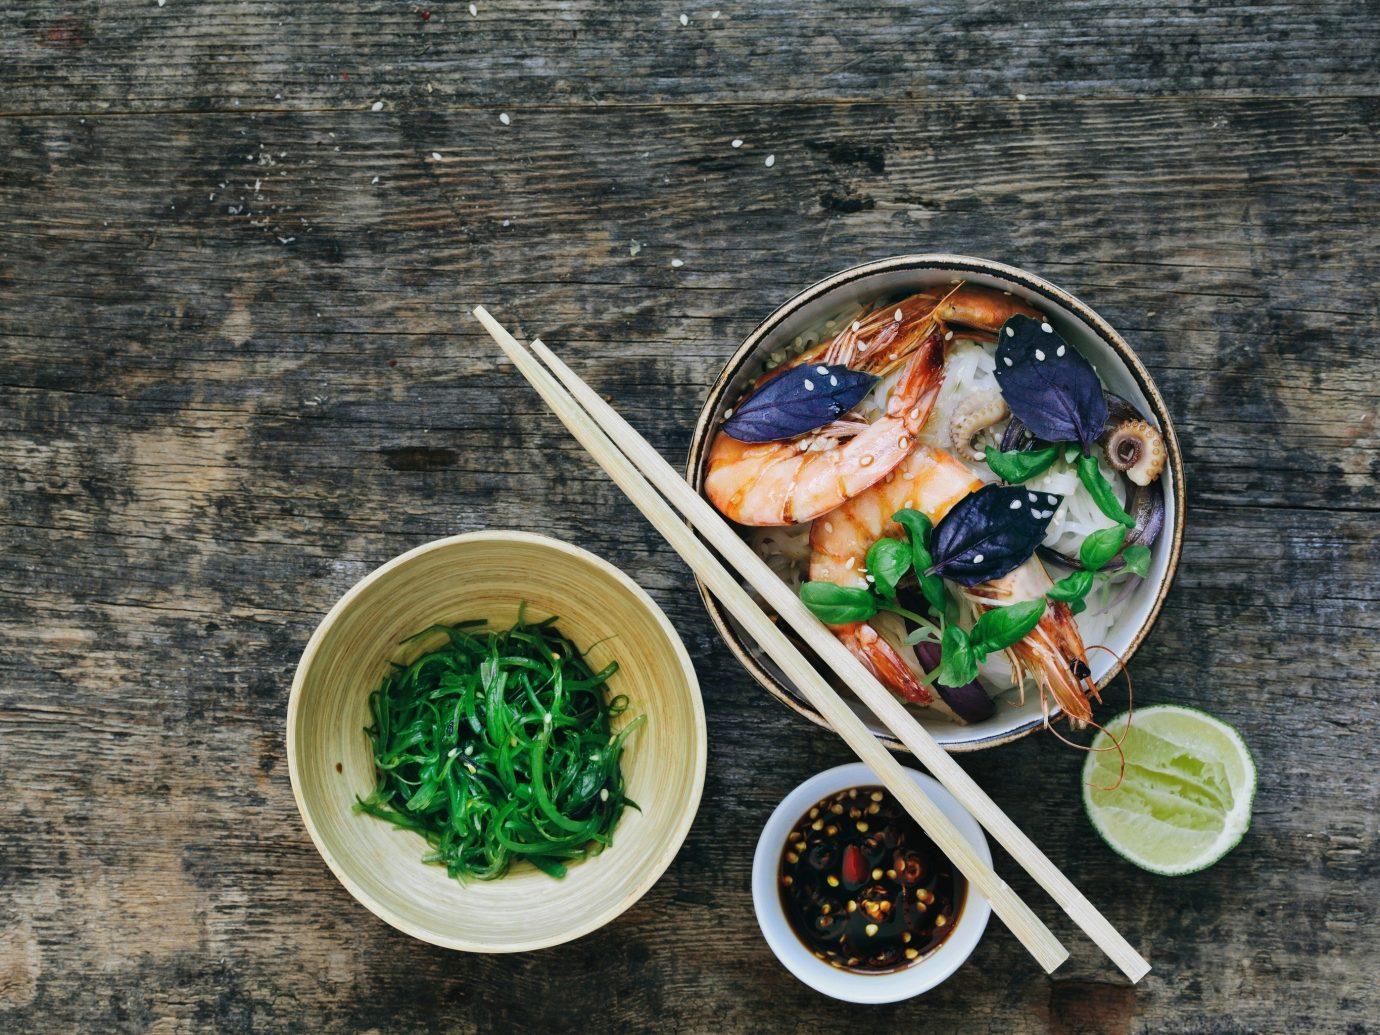 Jetsetter Guides dish green food leaf produce meal cuisine Seafood vegetable